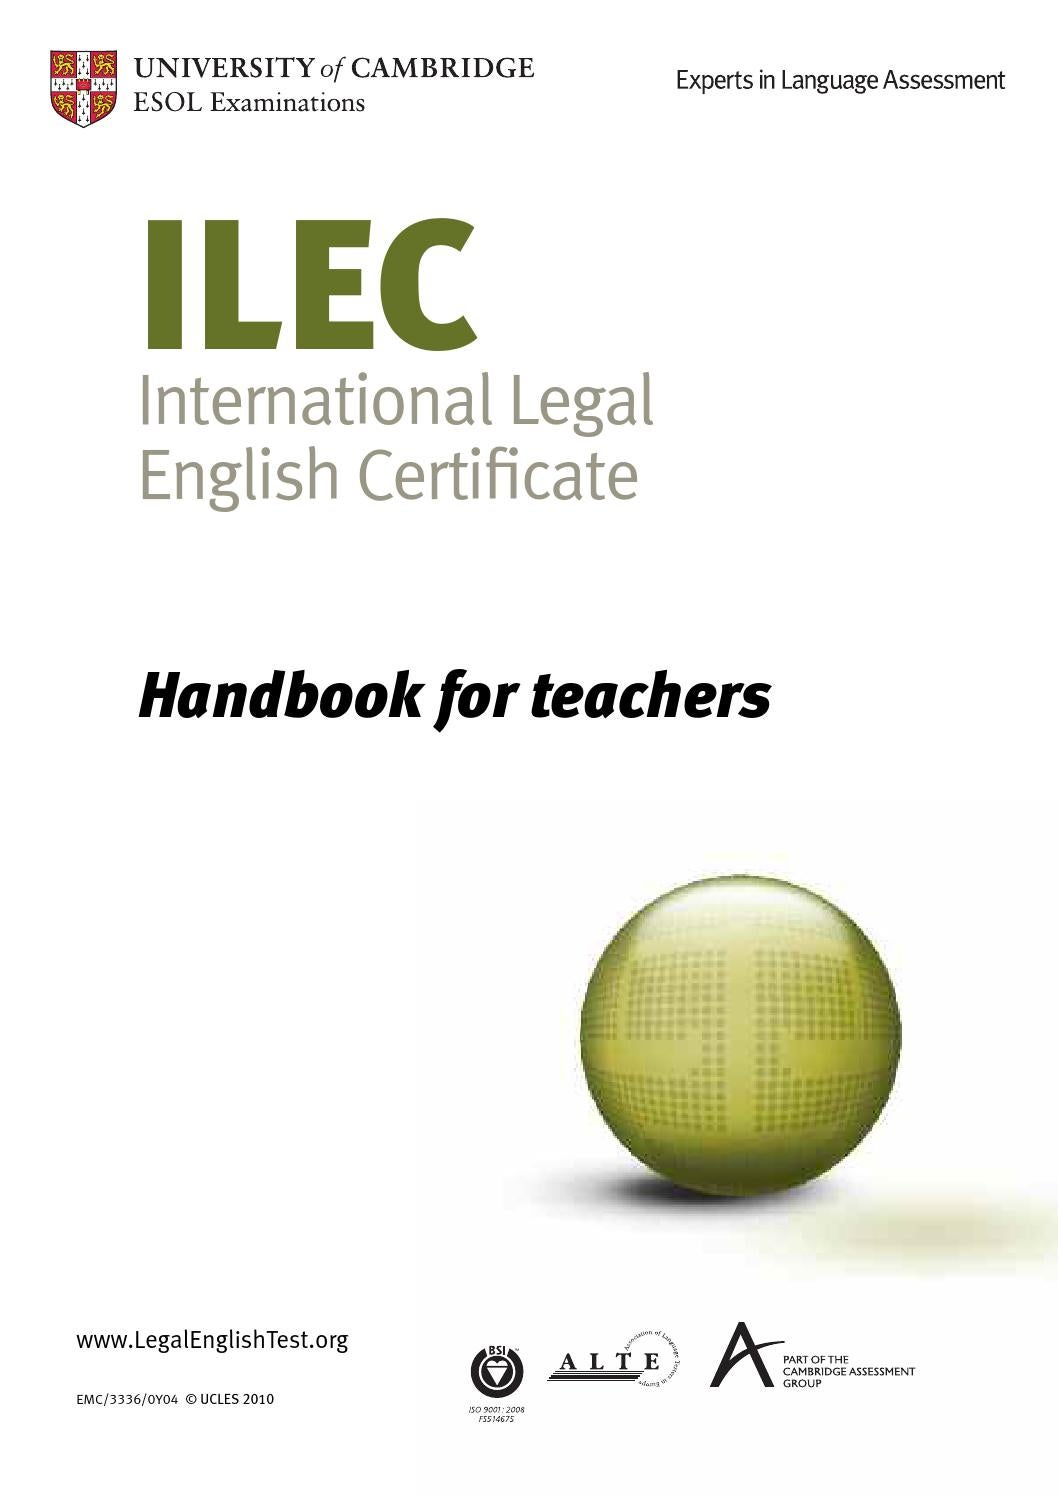 Ilec handbook by jorgeadm2000 issuu 1betcityfo Images